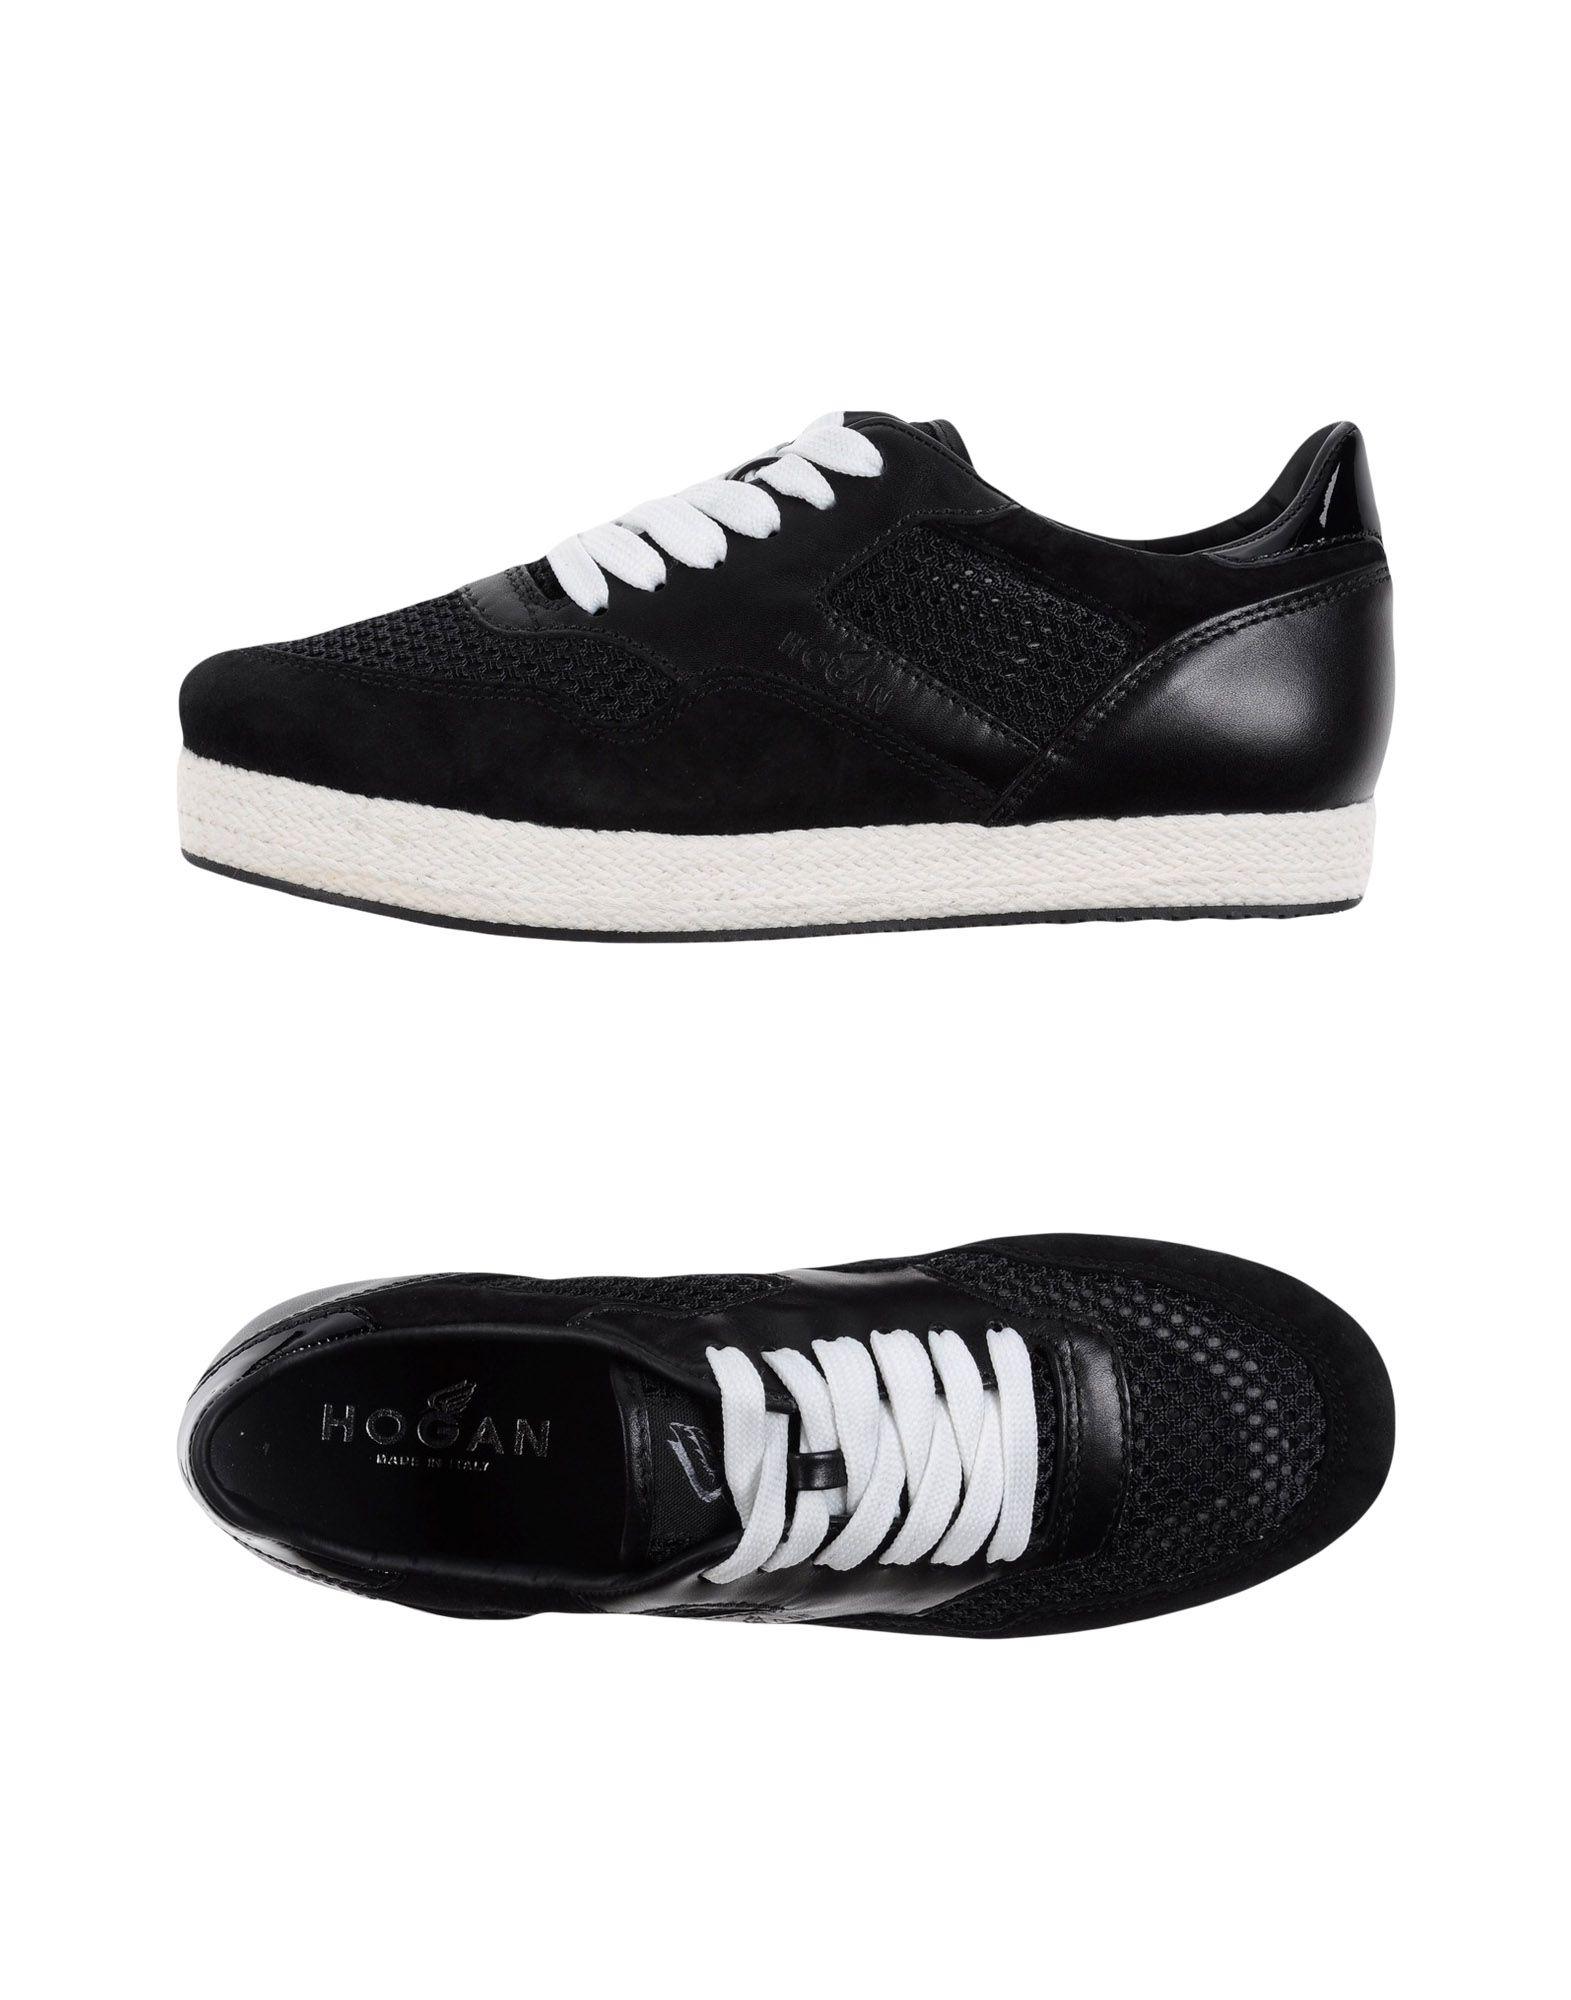 A buon mercato Sneakers Hogan Donna - 11157978IP